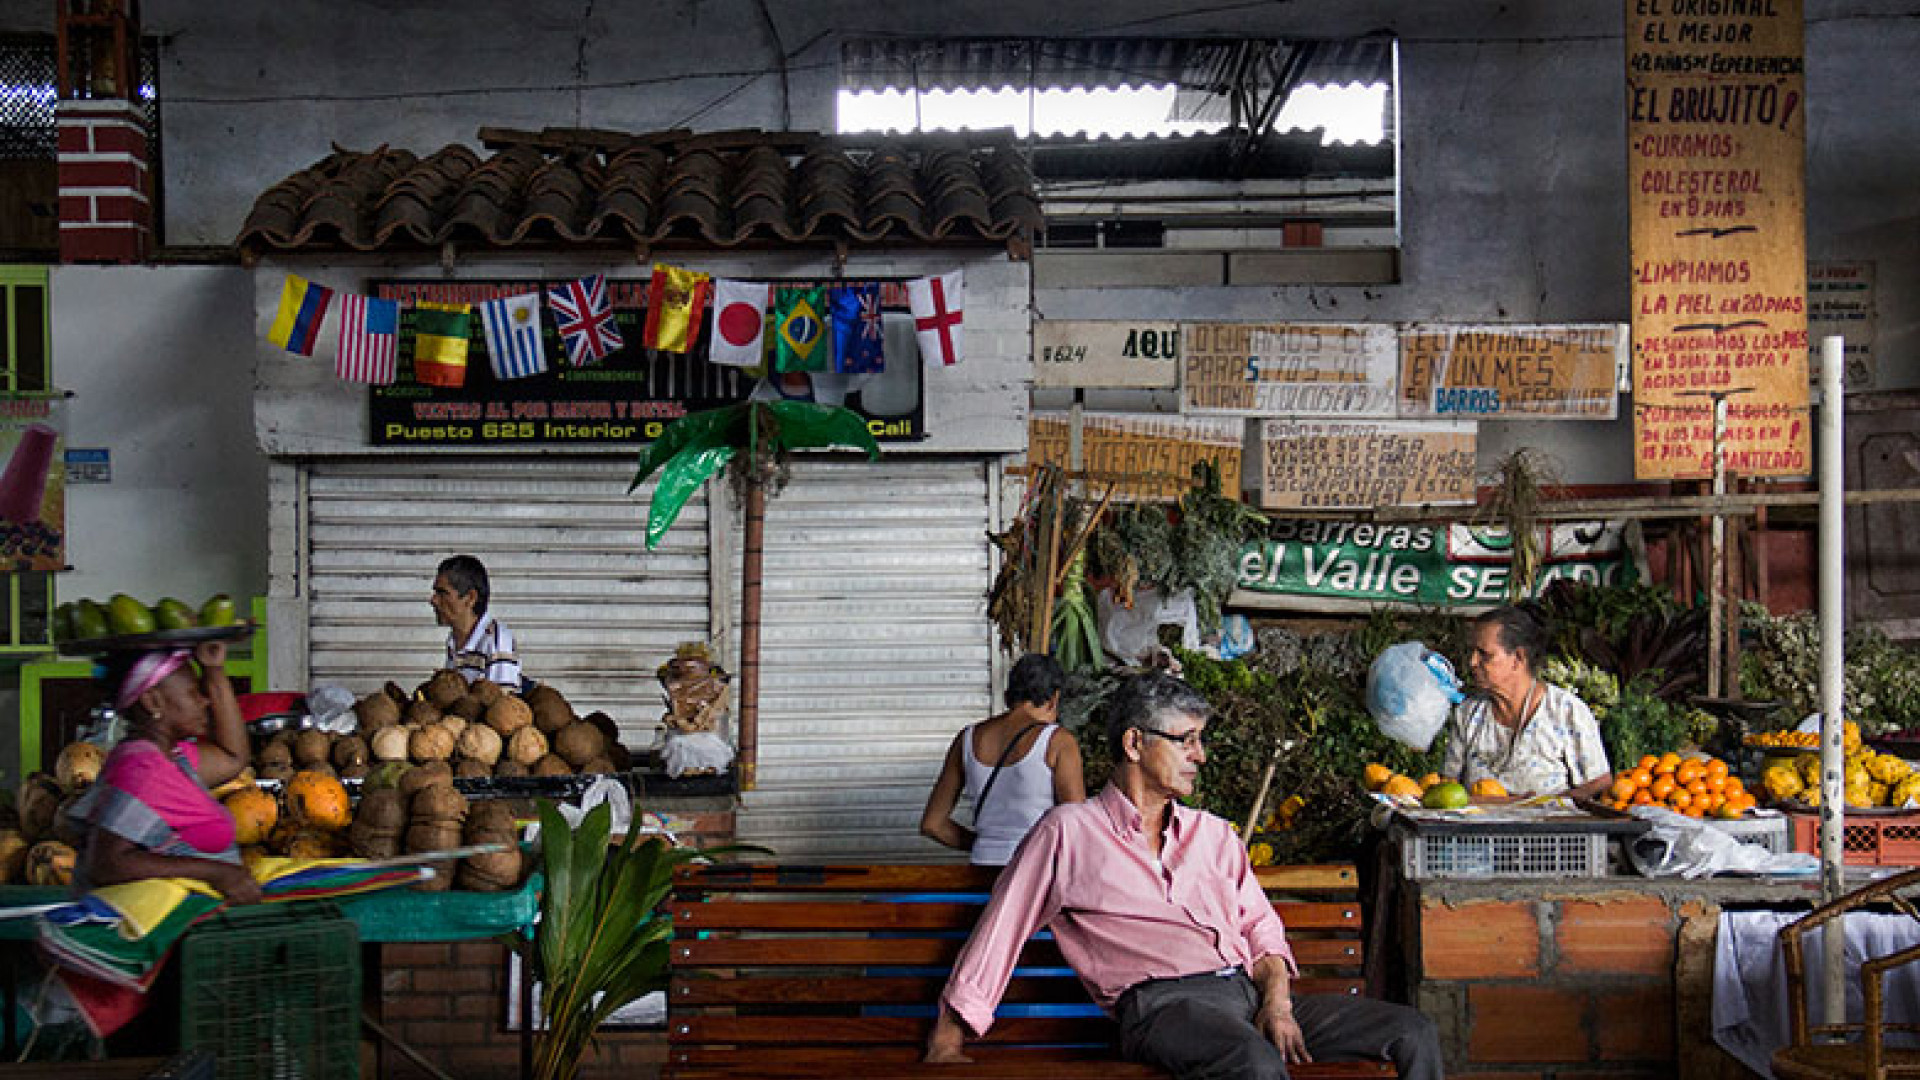 130686668152799161_AndrCs-Felipe-Caicedo-Sierra_Colombia_Shortlisted_Culture_2015-2